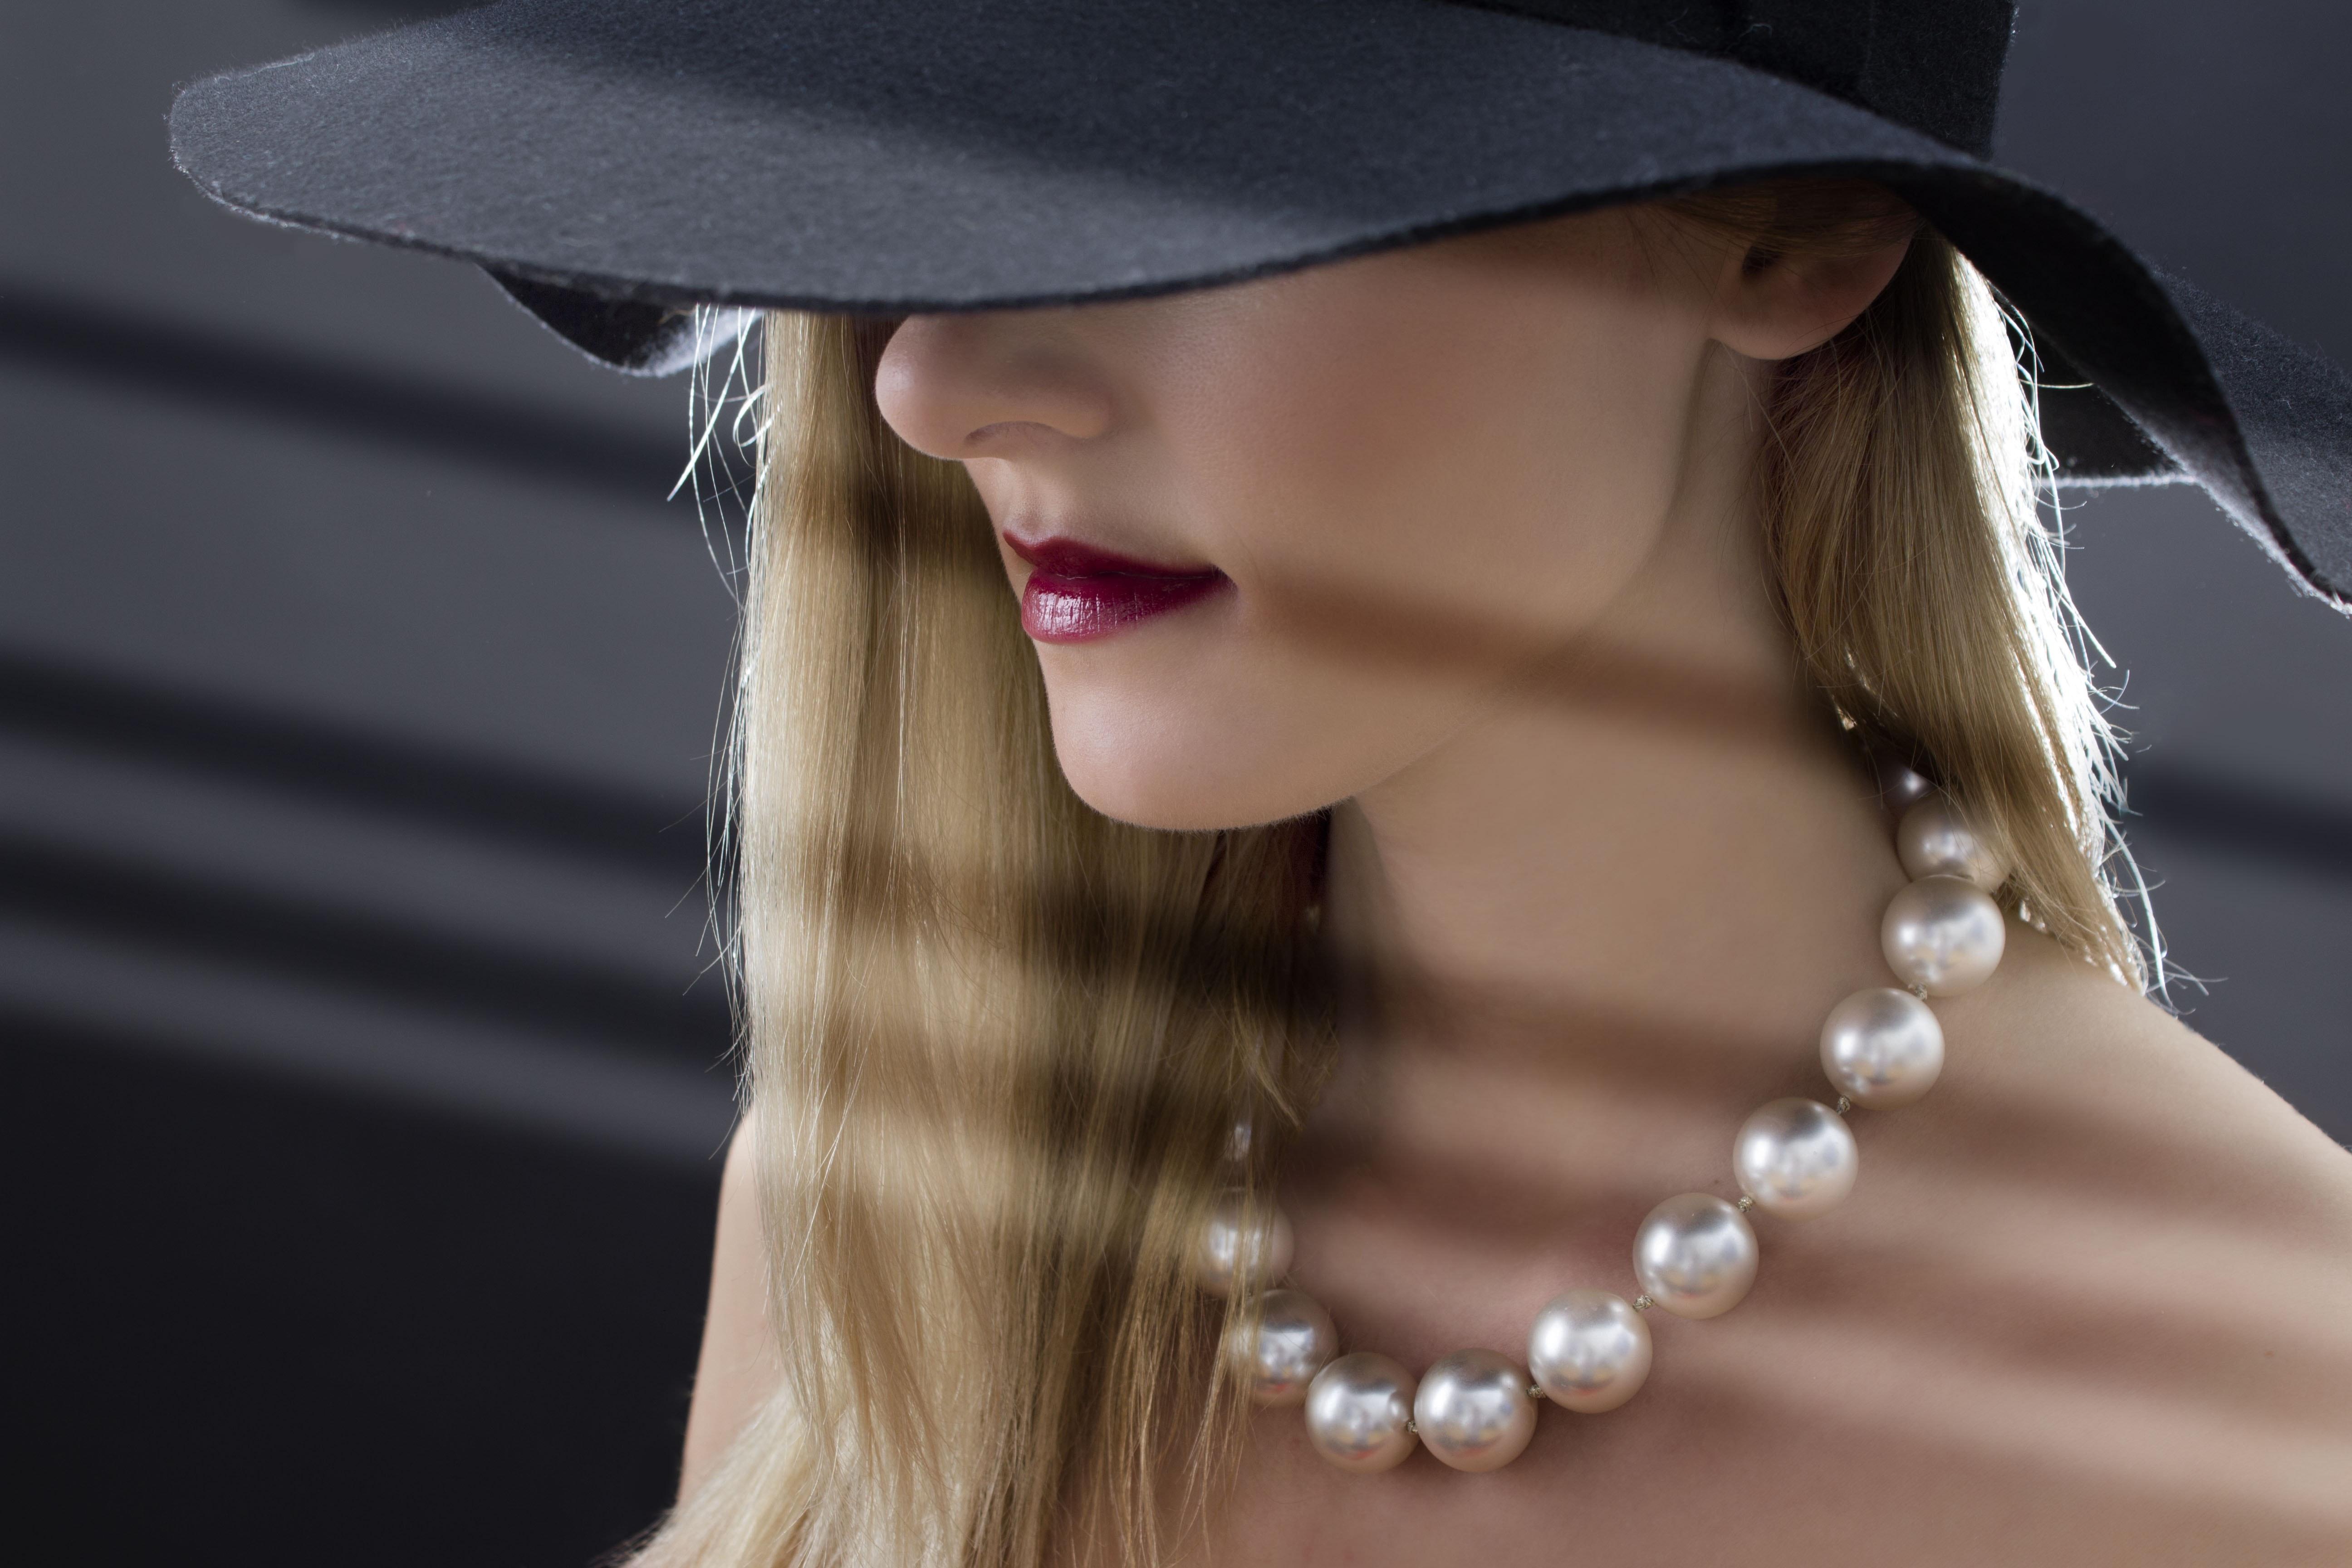 Woman wearing hat photo